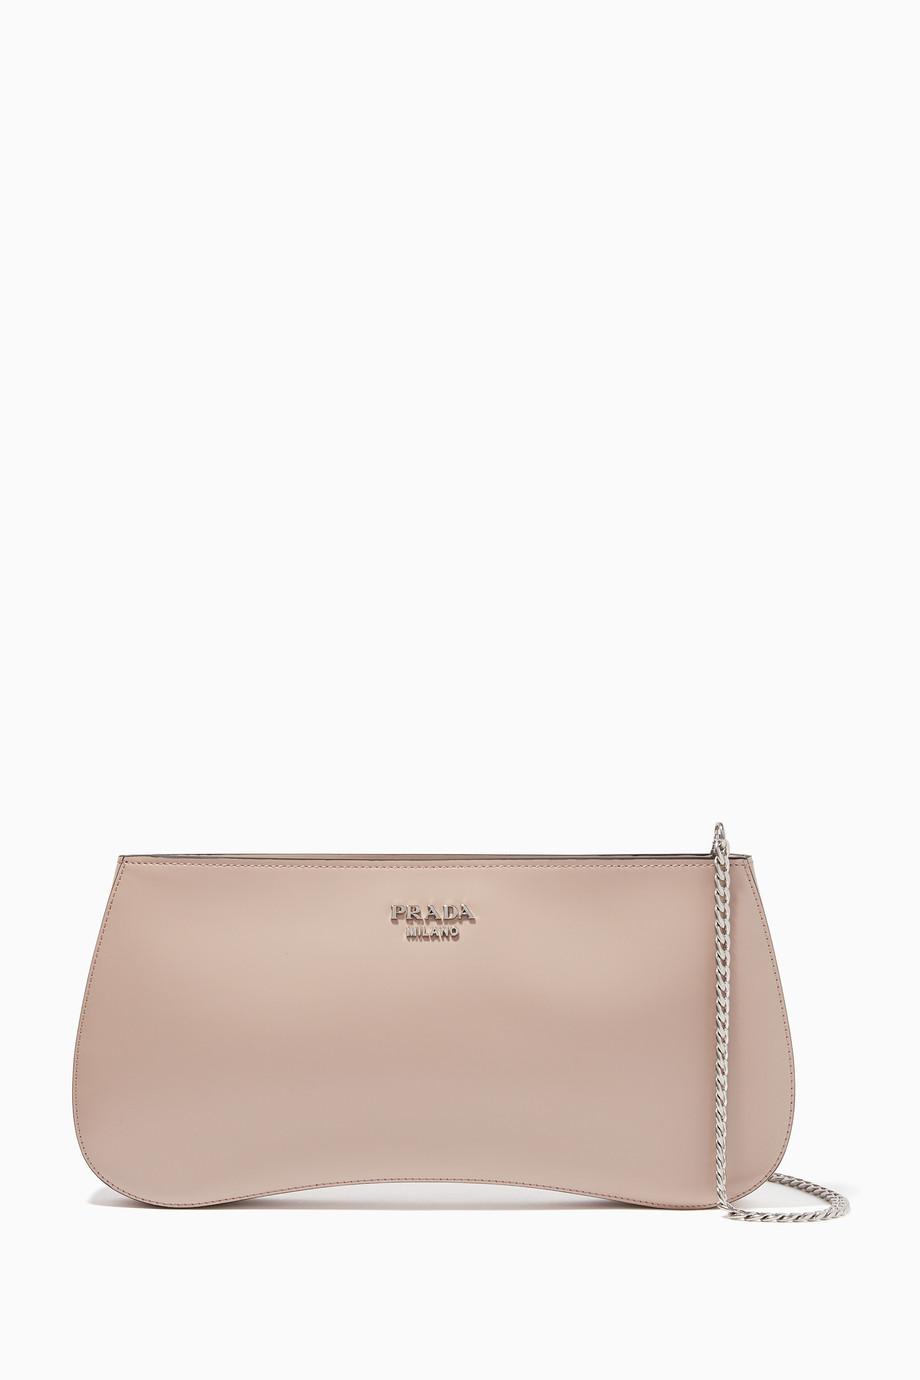 007e7192 Shop Prada Pink Sidonie Leather Cross-Body Bag for Women | Ounass UAE